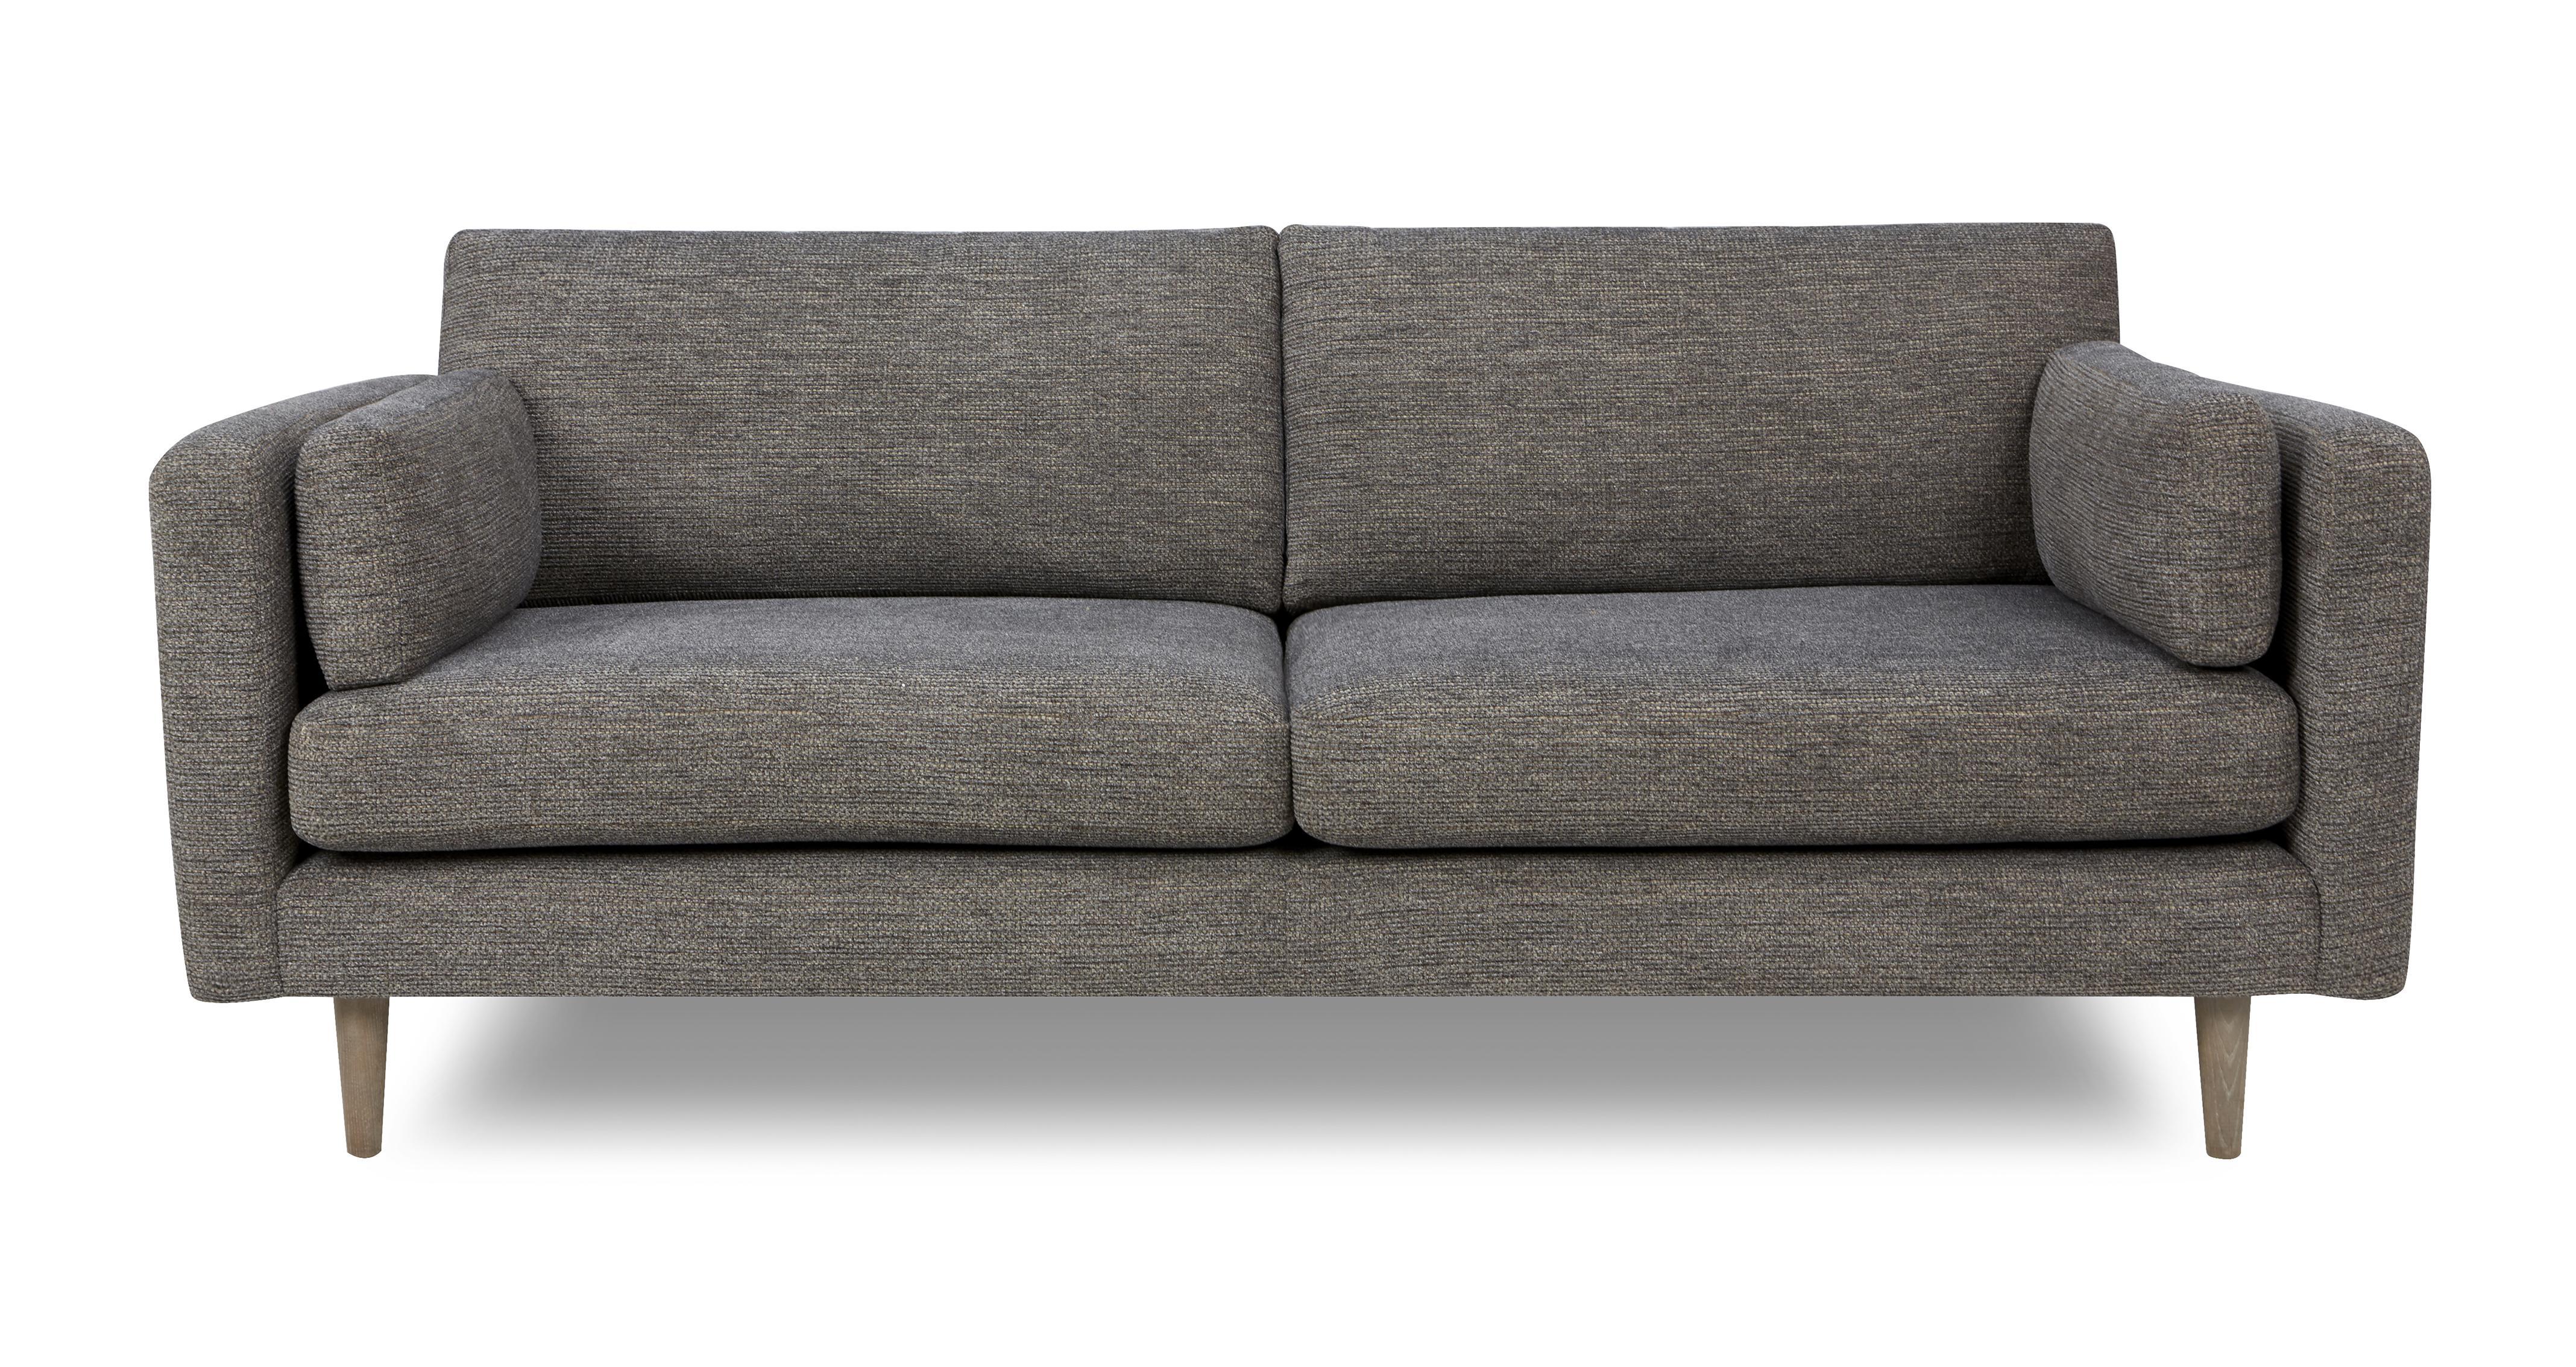 sofa company nl good bed uk marl fabric grote bank weave dfs banken